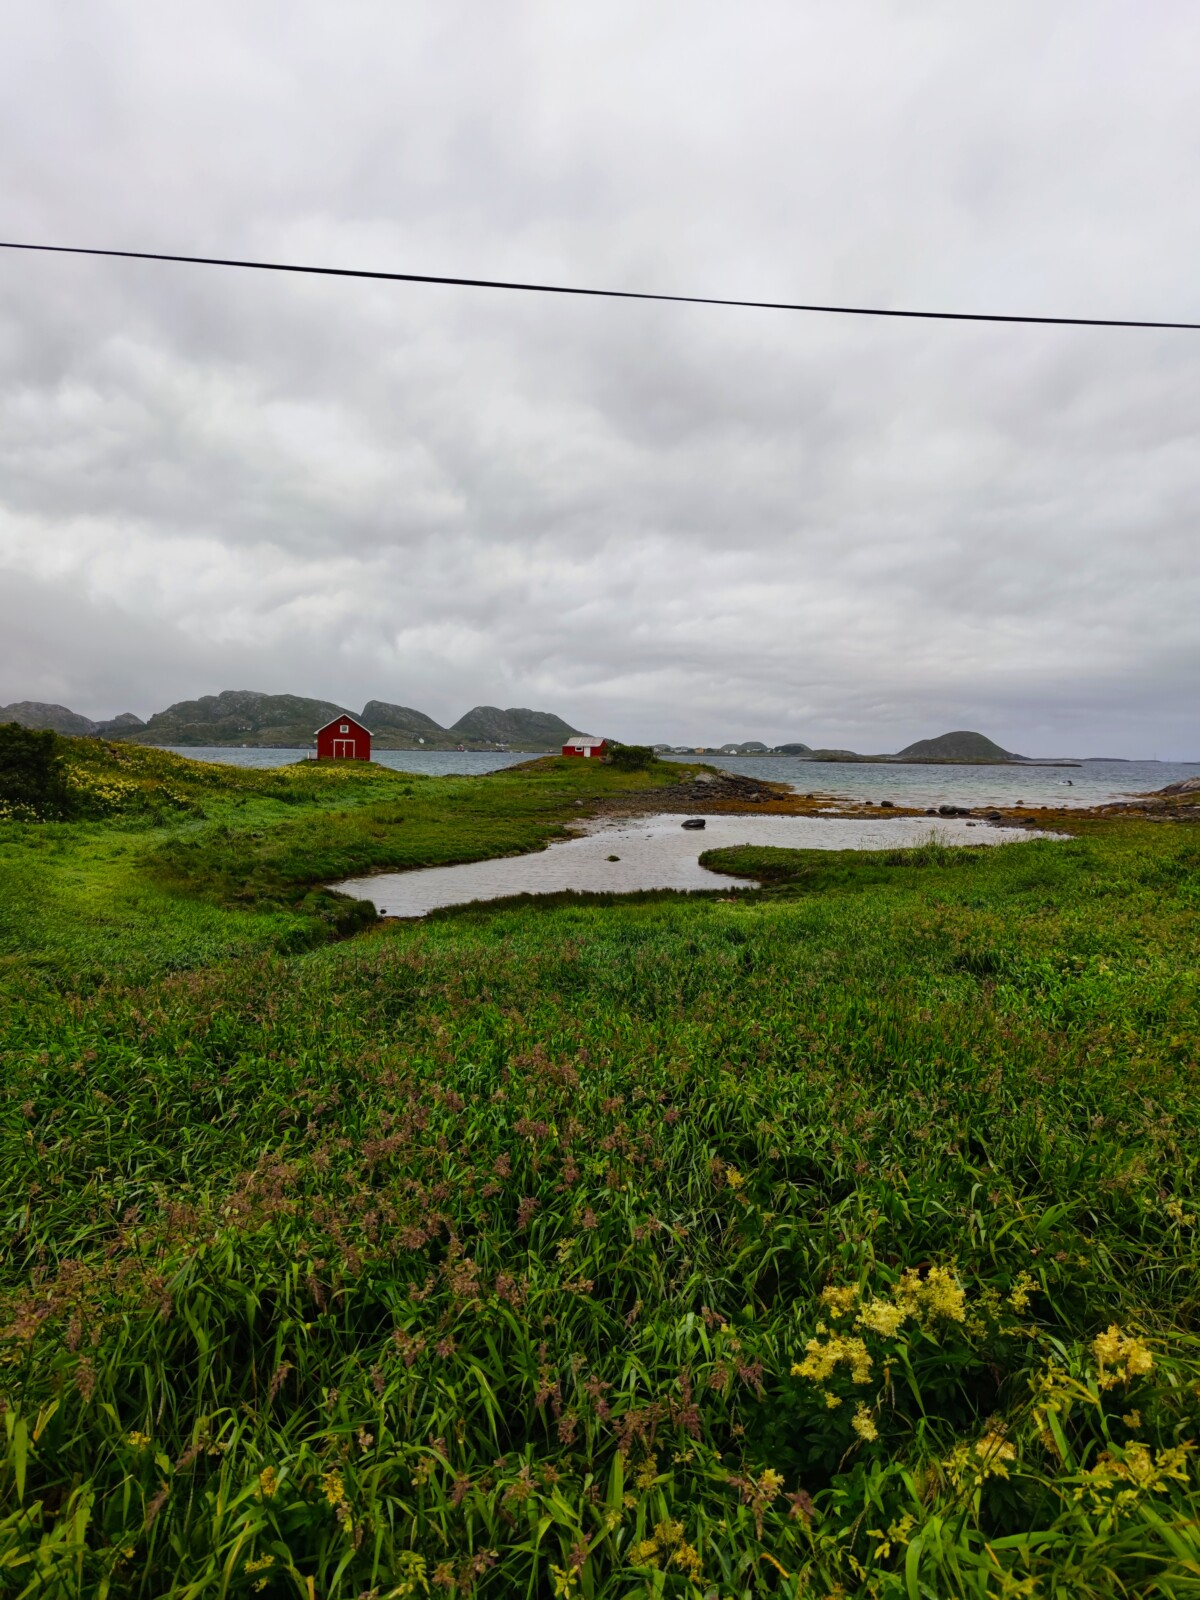 bildedryss-bilder-nordnorge-nord-norge-seløy-seløya-helgeland-herøy-sandnessjøen-mosjøen-natur-norge-norway-northofnorway-trondheim-vakkernatur-isalicious-klartvann-strang-norgesommer-norgessommer-sommer-helgelandskysten-isalicious.blogg.no-fisk-